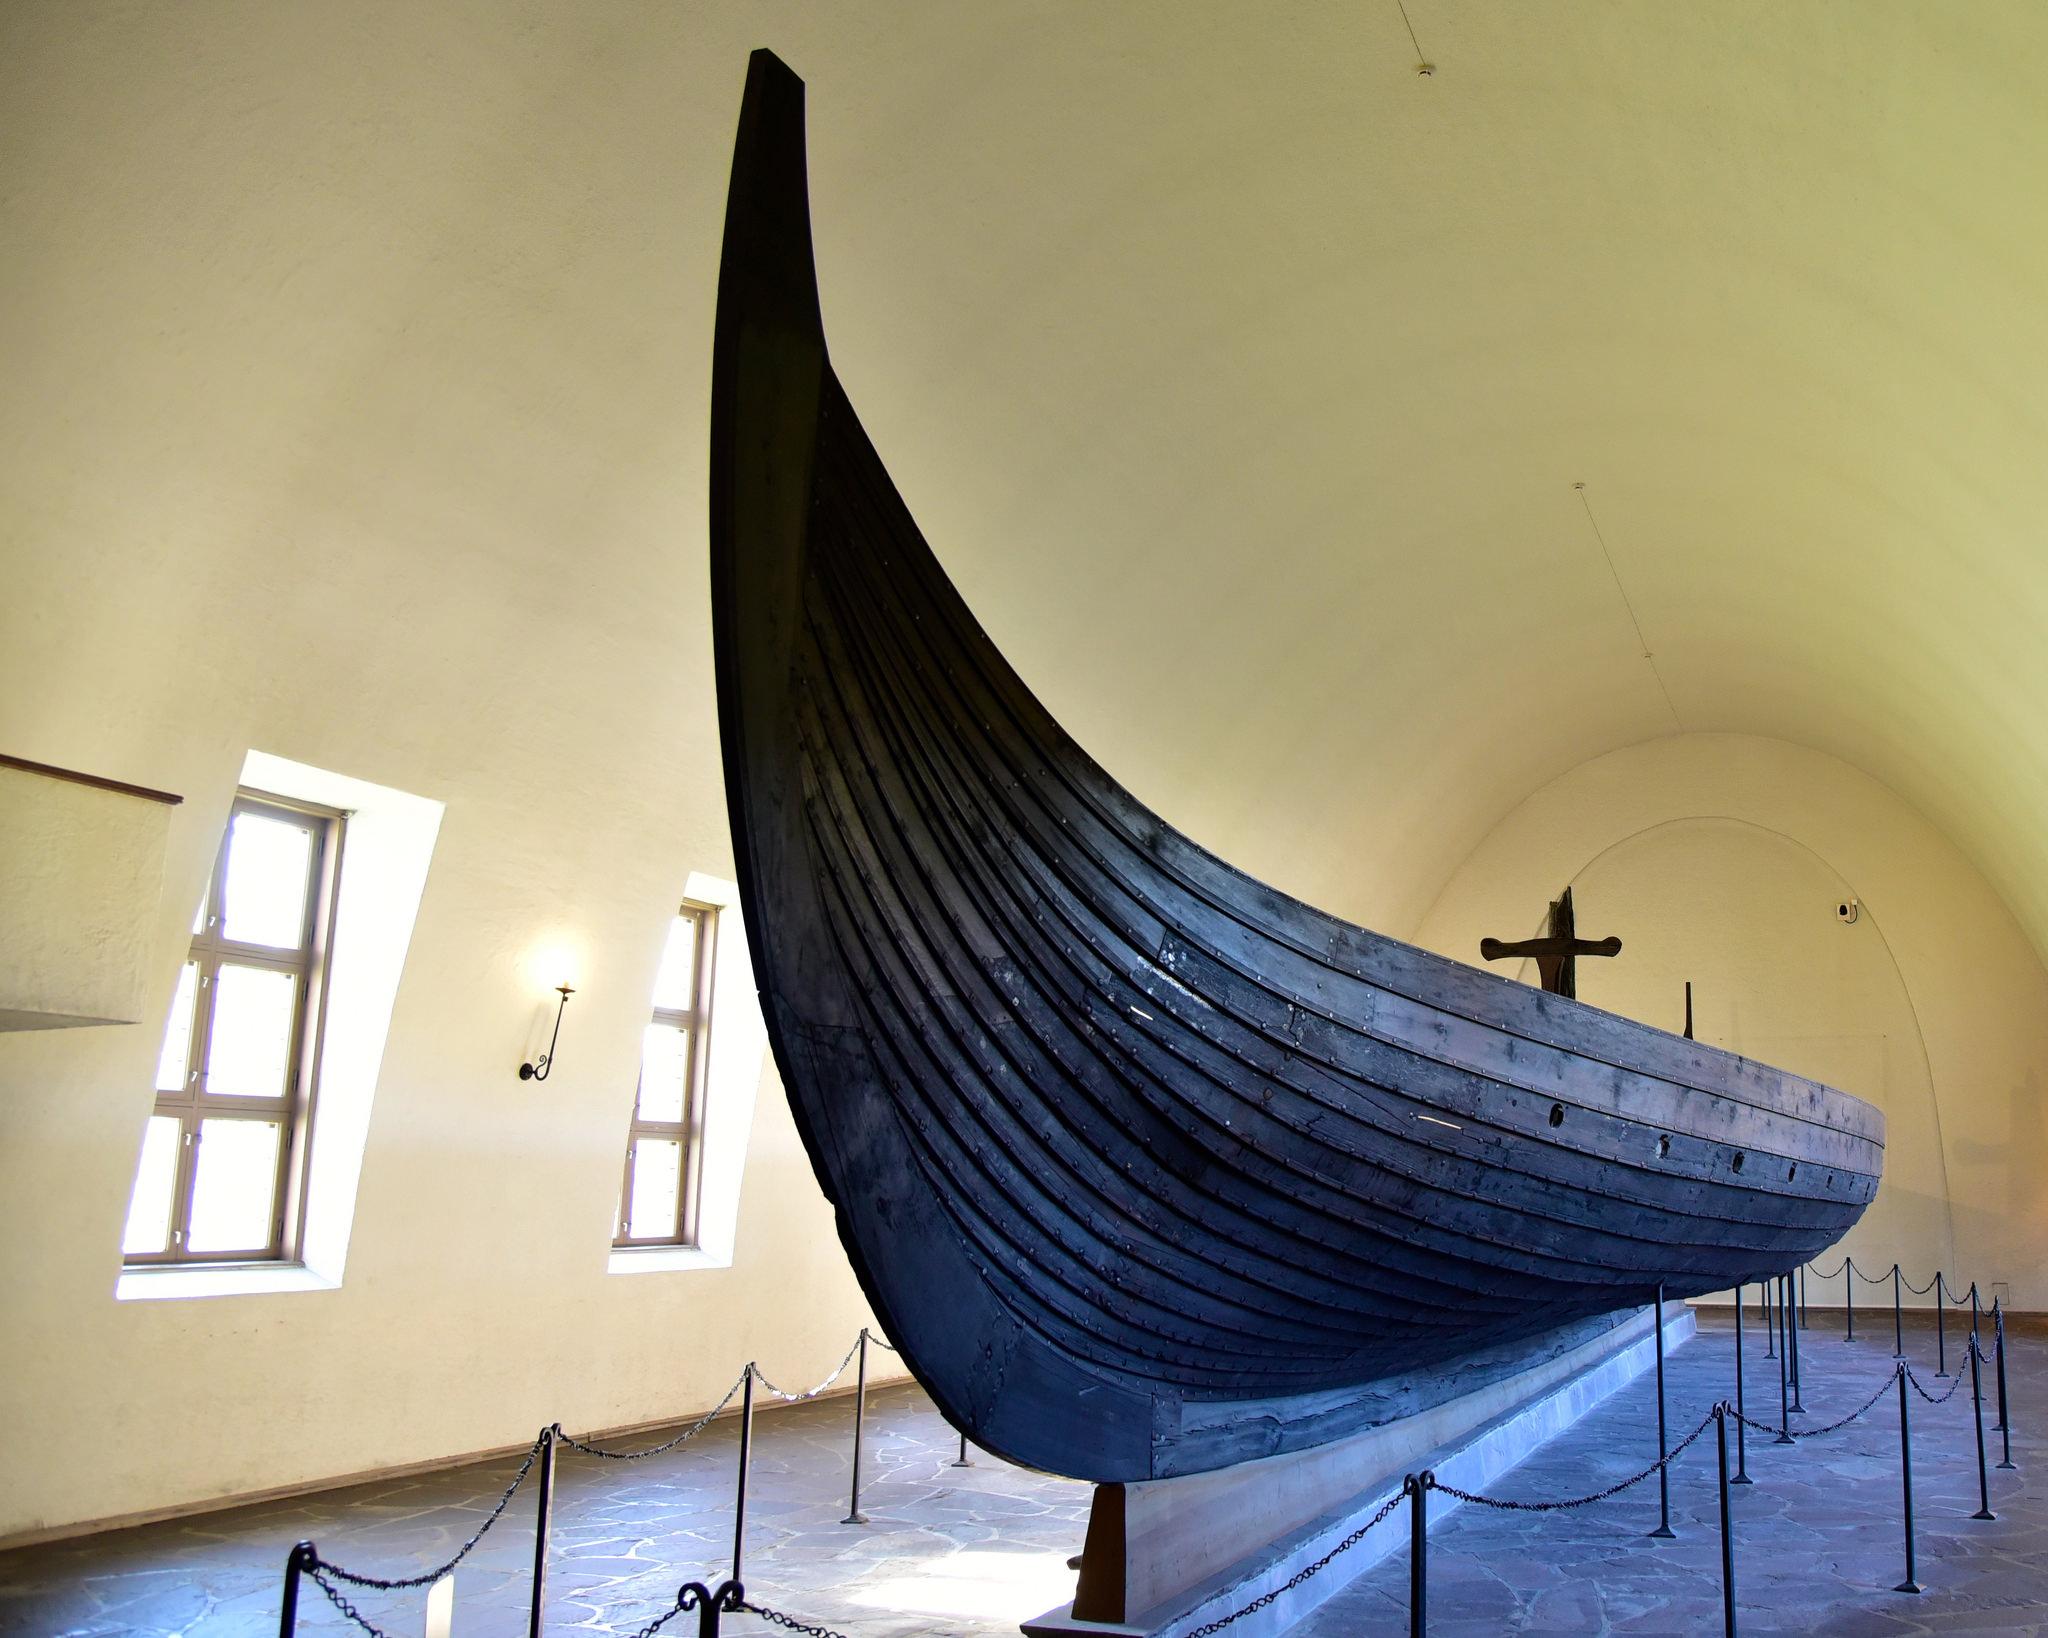 Viking Ship Museum | © Larry Lamsa / flickr